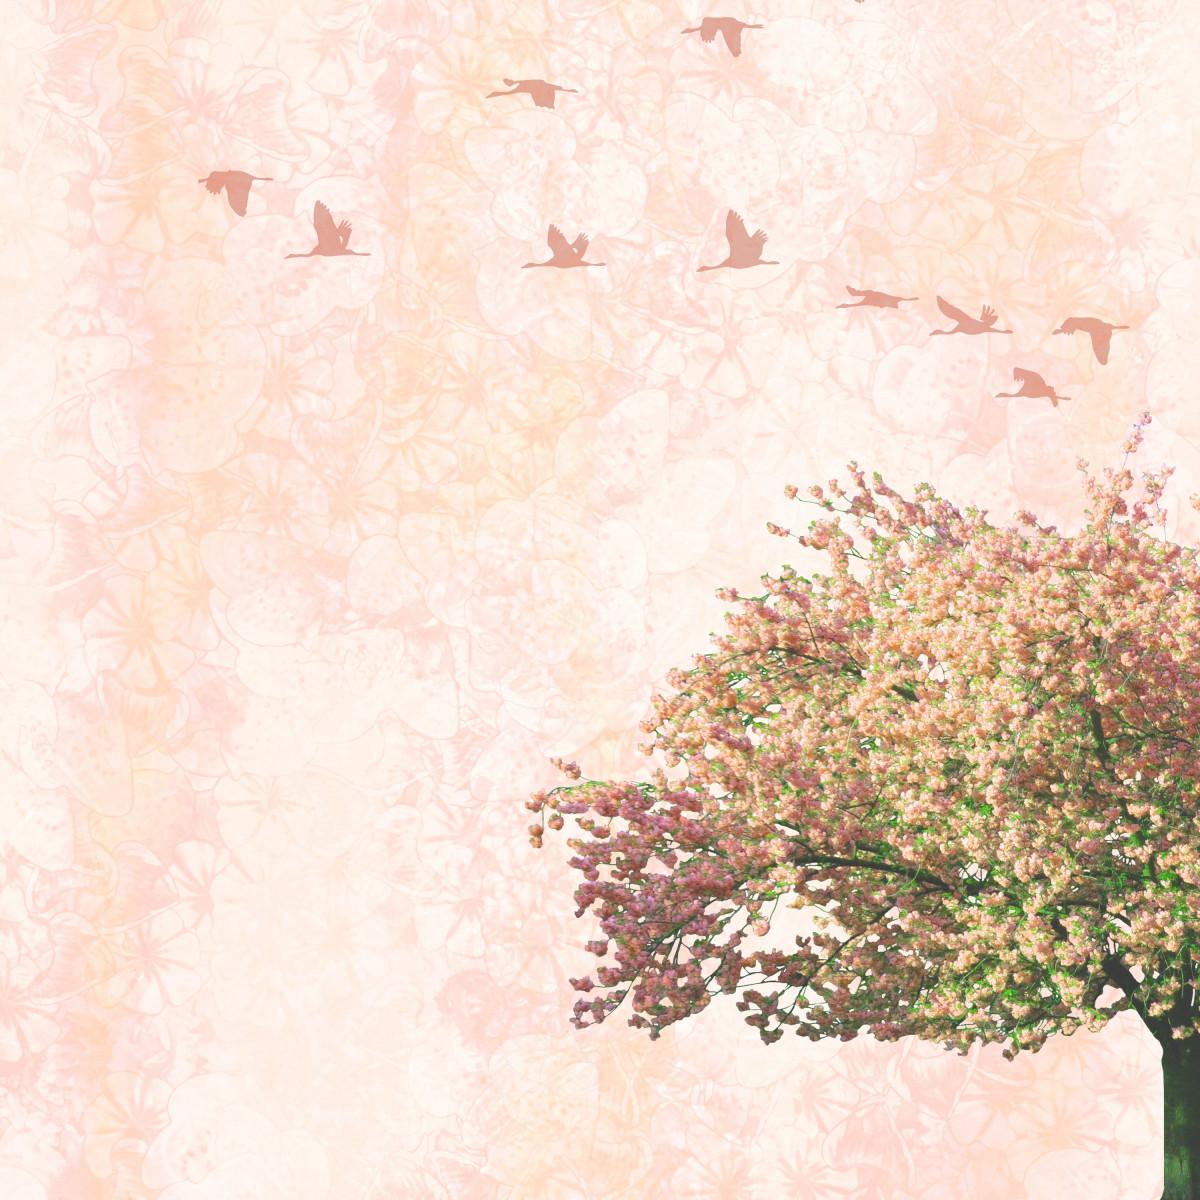 Fotos gratis rbol rama vendimia retro textura flor - Papel pintado ramas arbol ...